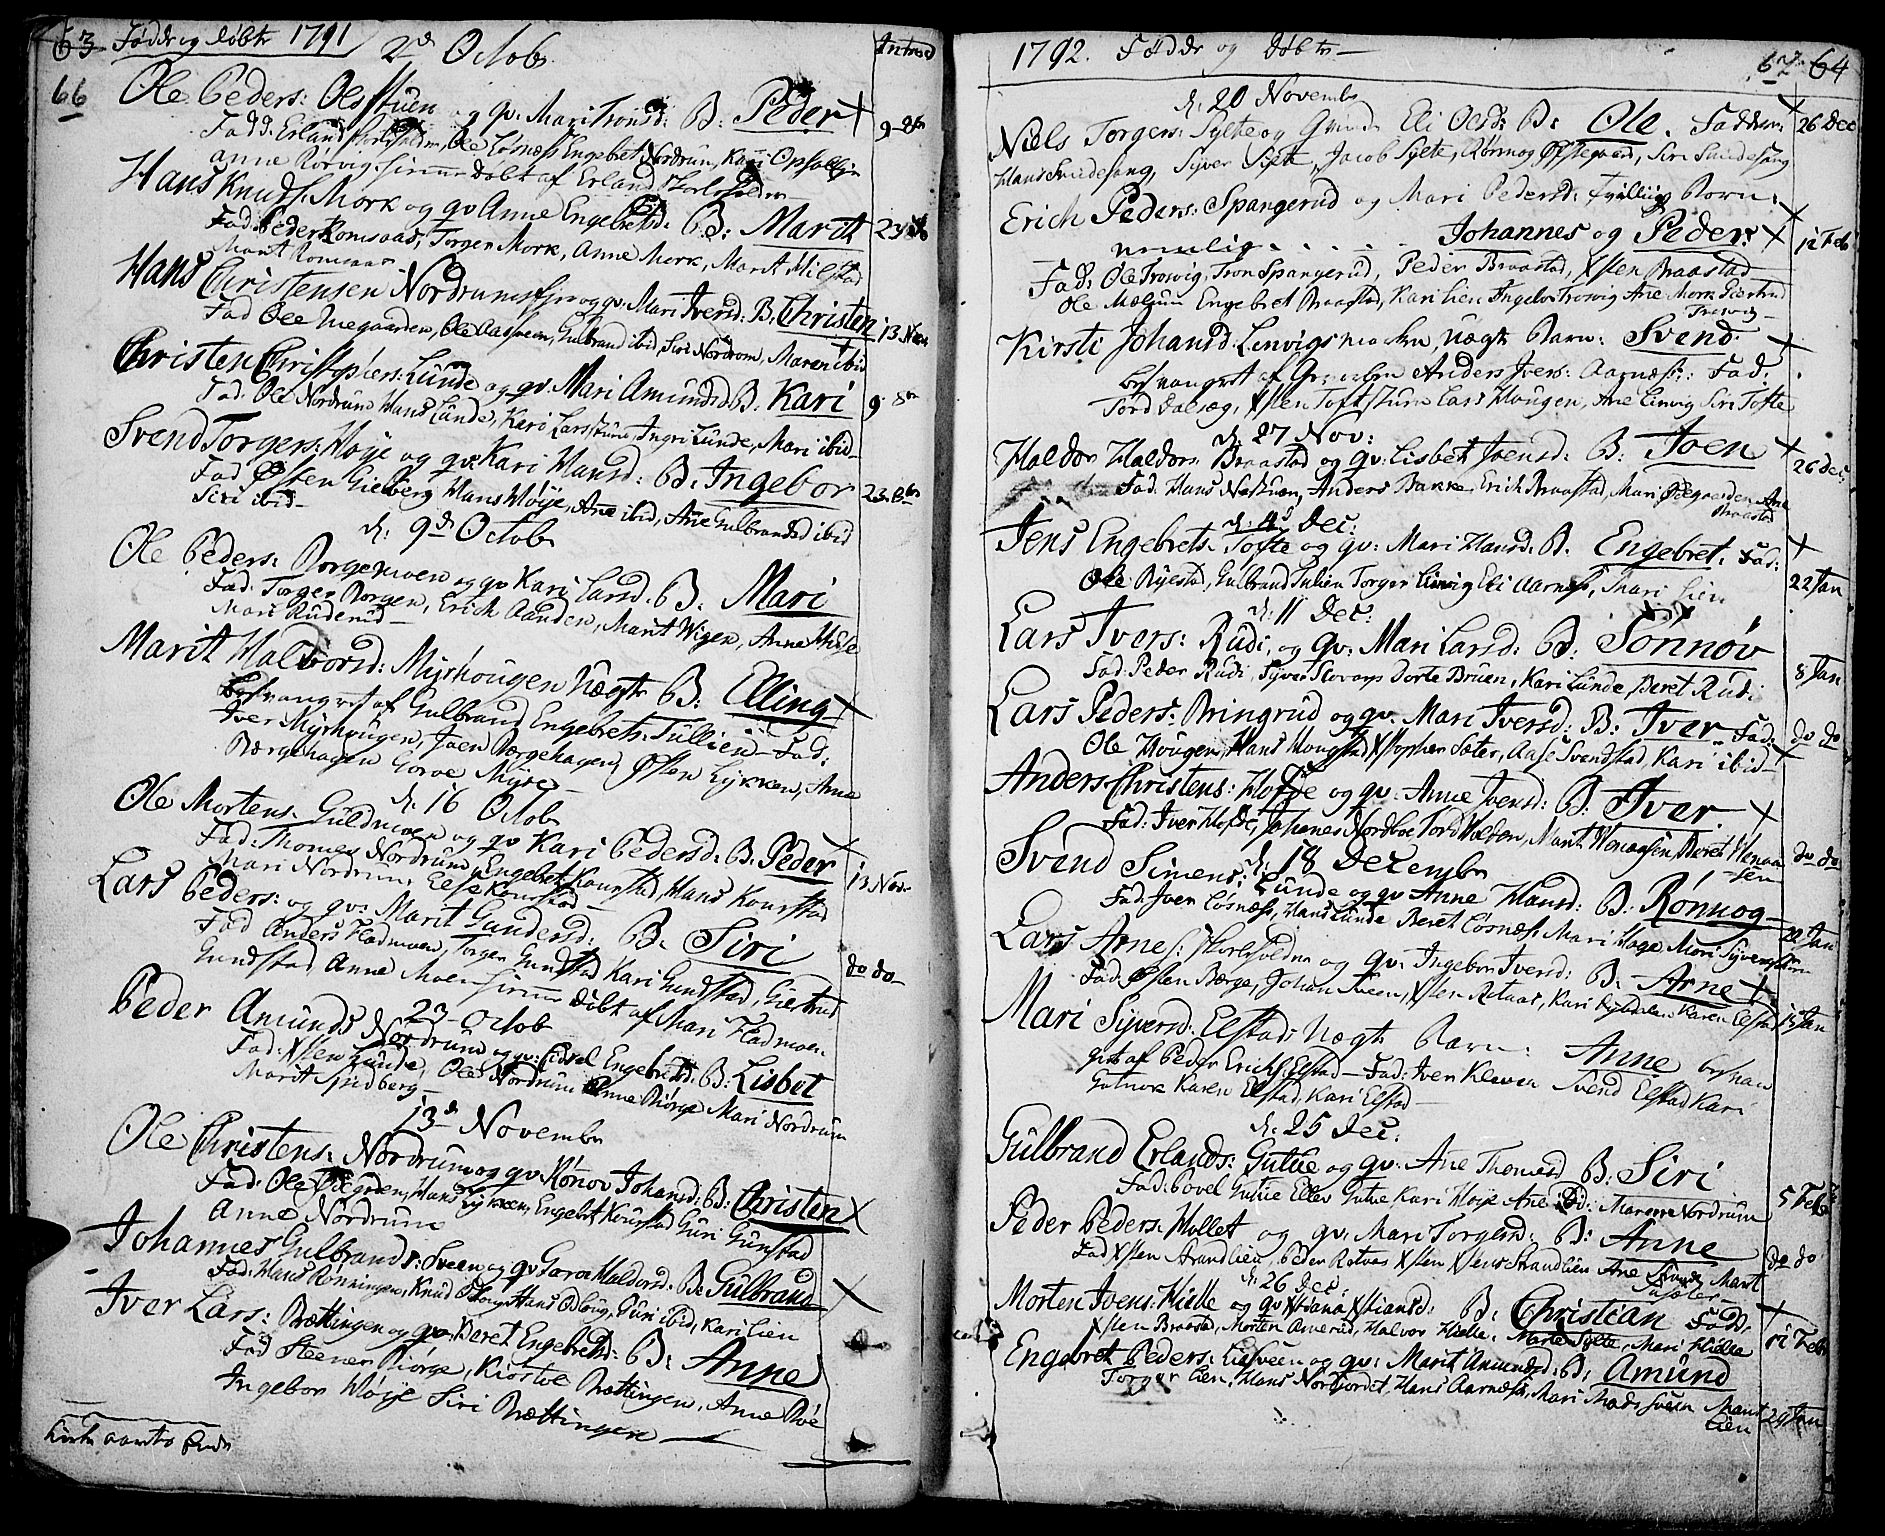 SAH, Ringebu prestekontor, Ministerialbok nr. 3, 1781-1820, s. 66-67